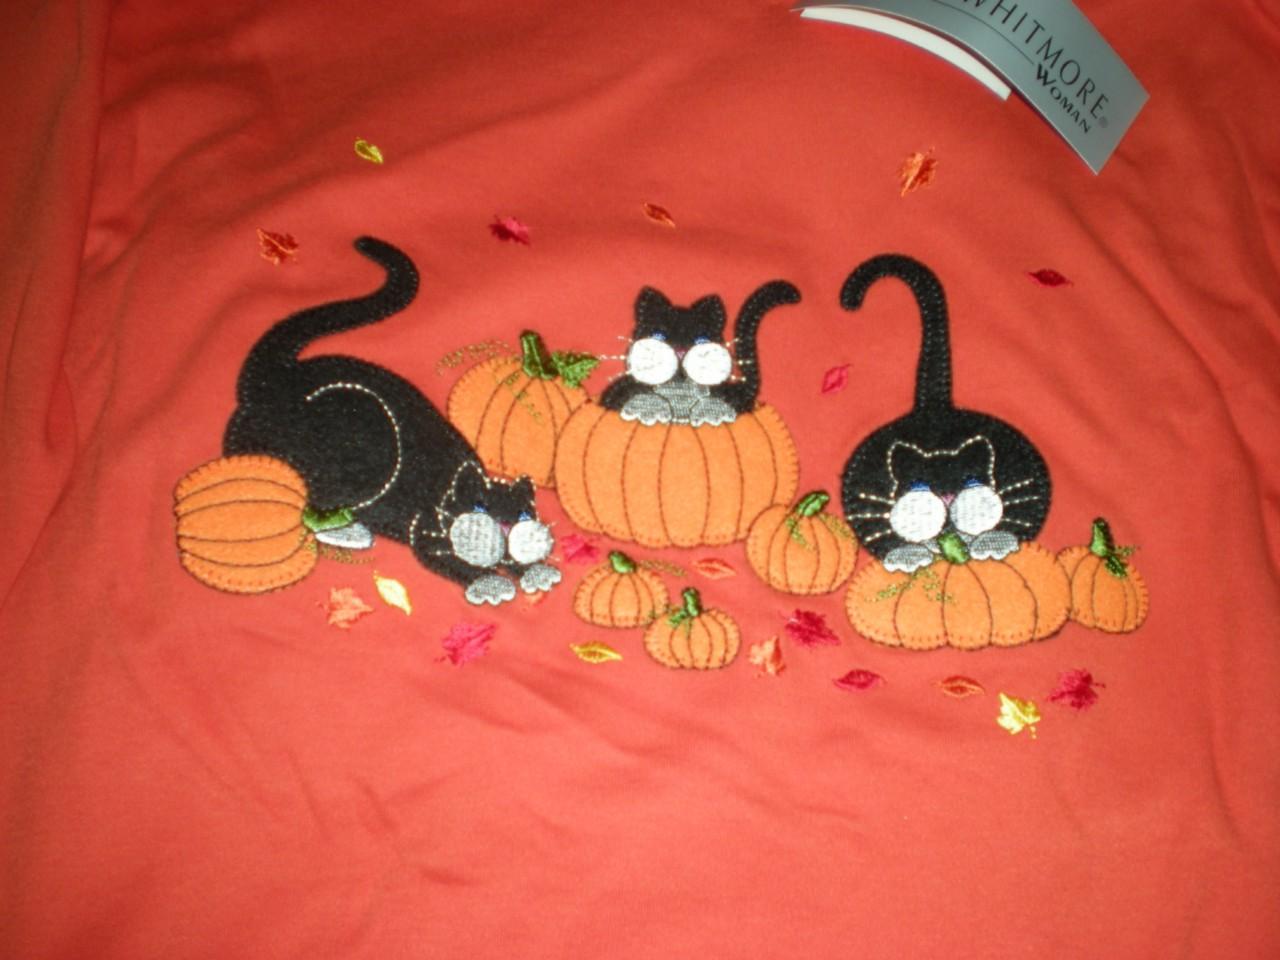 New Halloween Black Cats Pumkin Shirt Top Orange Large